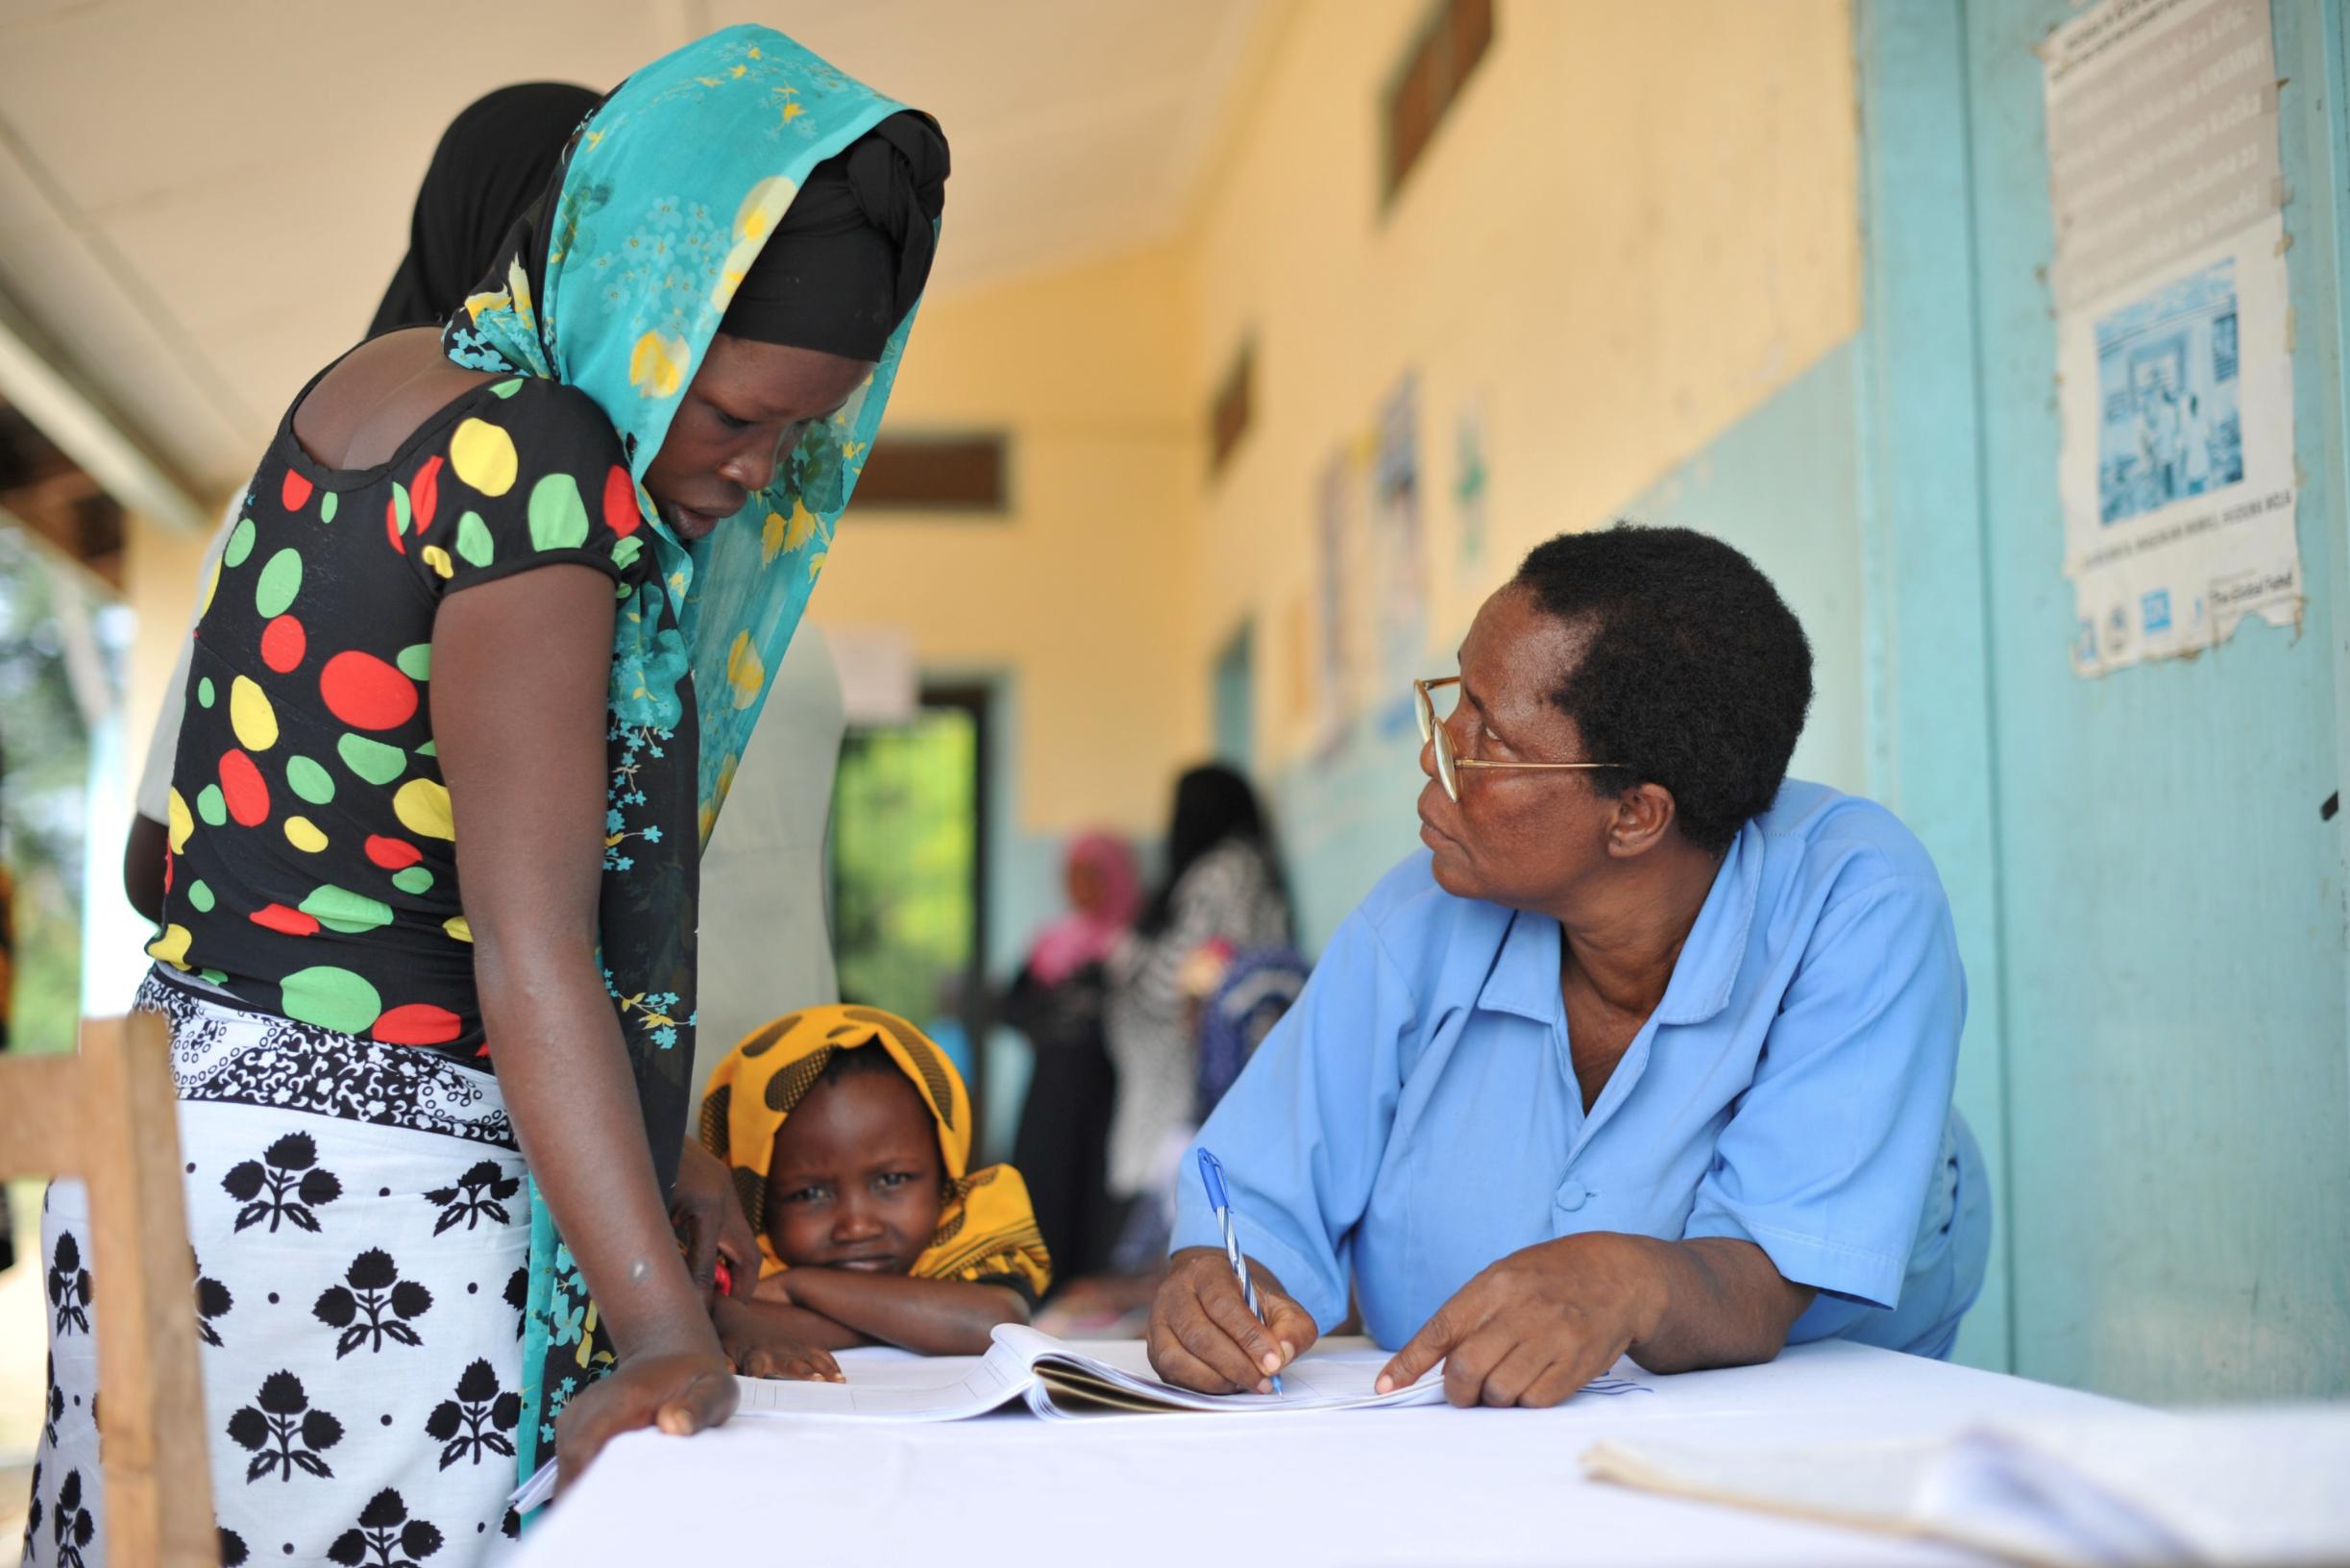 Health Officer gathers information from a Tanzanian woman at Duga Maforoni, Tanzania.